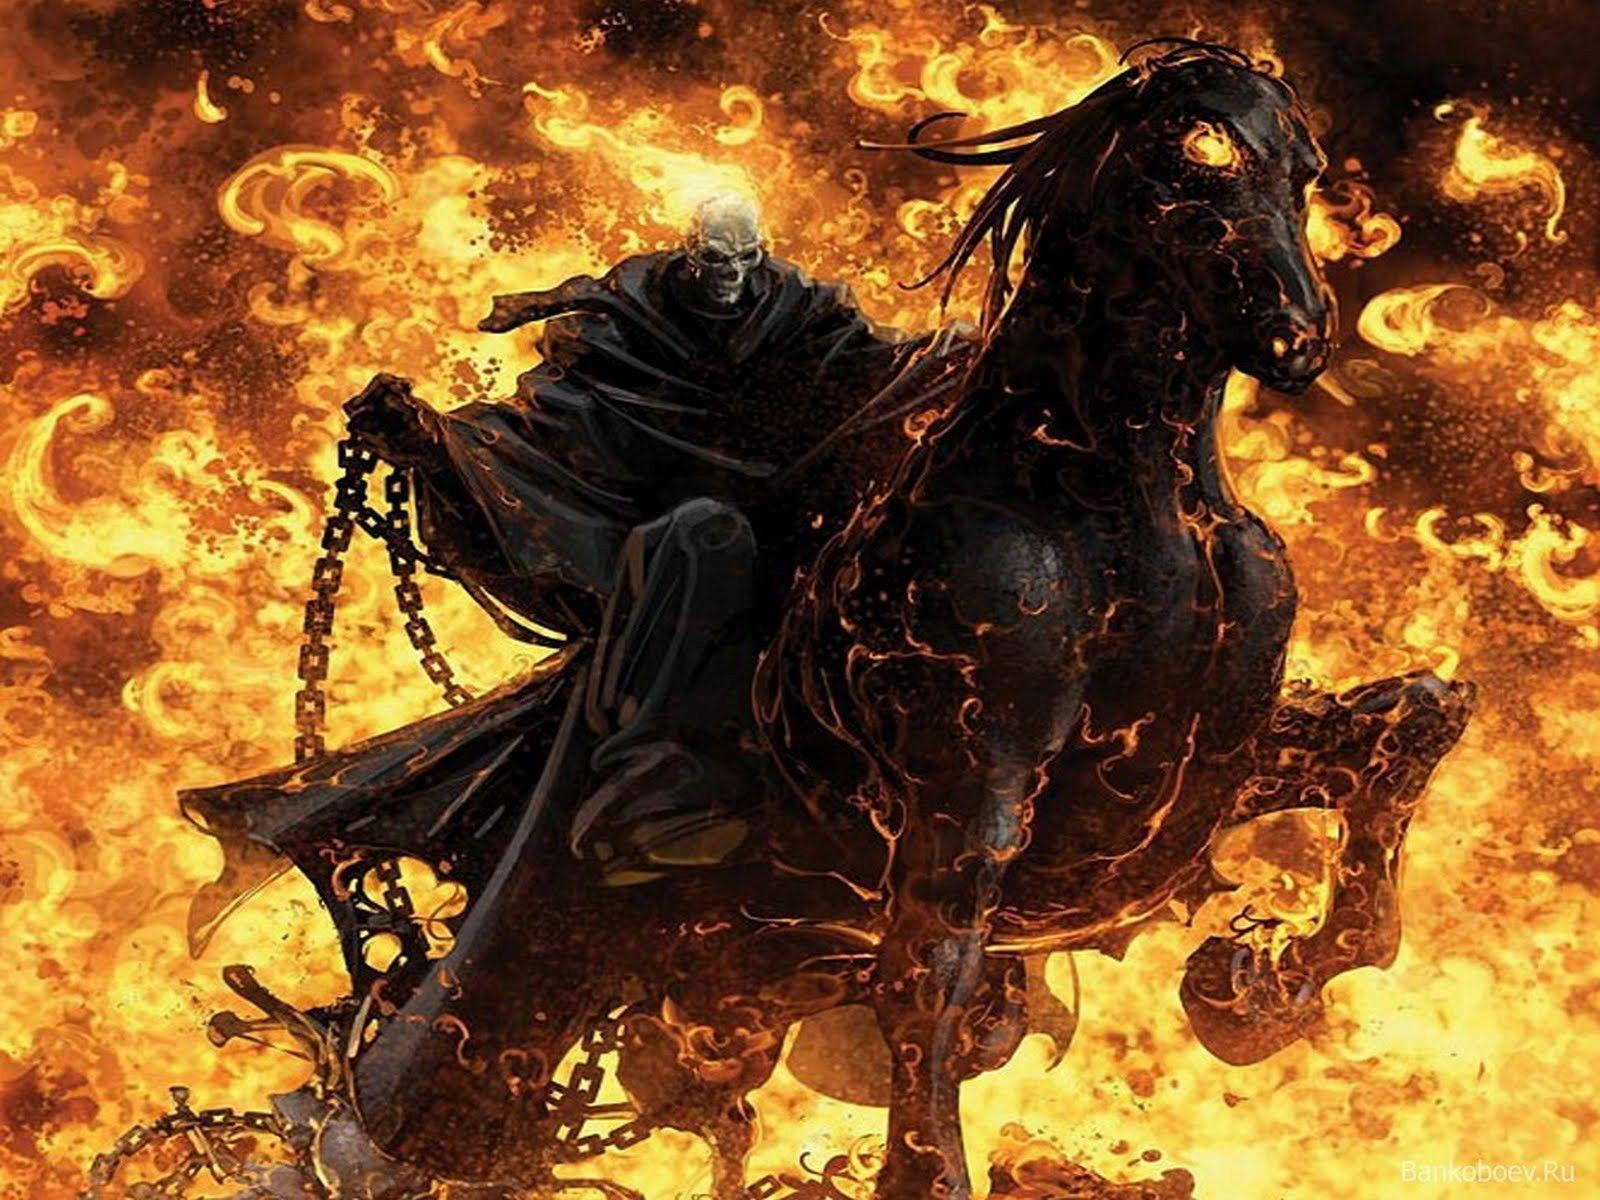 Beautiful Wallpaper Horse Ghost Rider - c19ab5a749cd0d2b2f32153579ebbbb8  Pic_672210.jpg